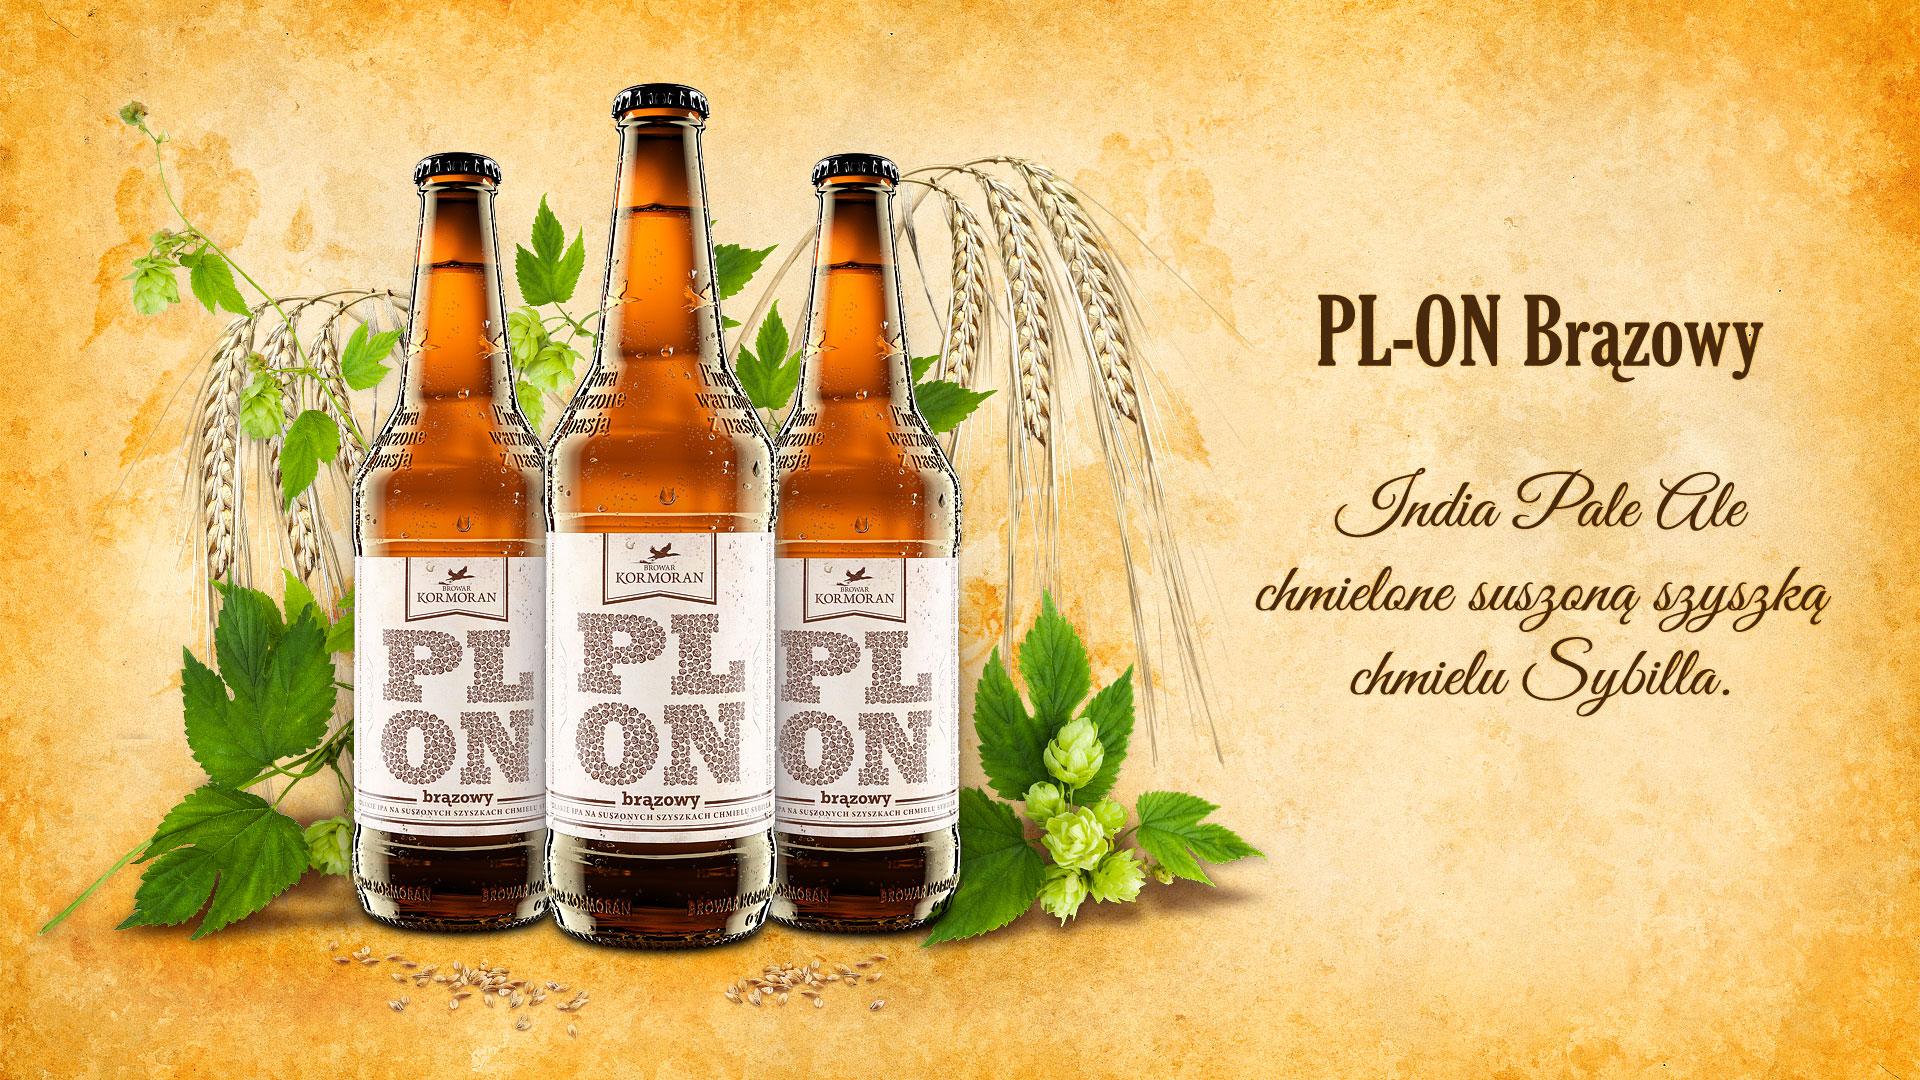 Piwo PLON Brązowy - Browar Kormoran